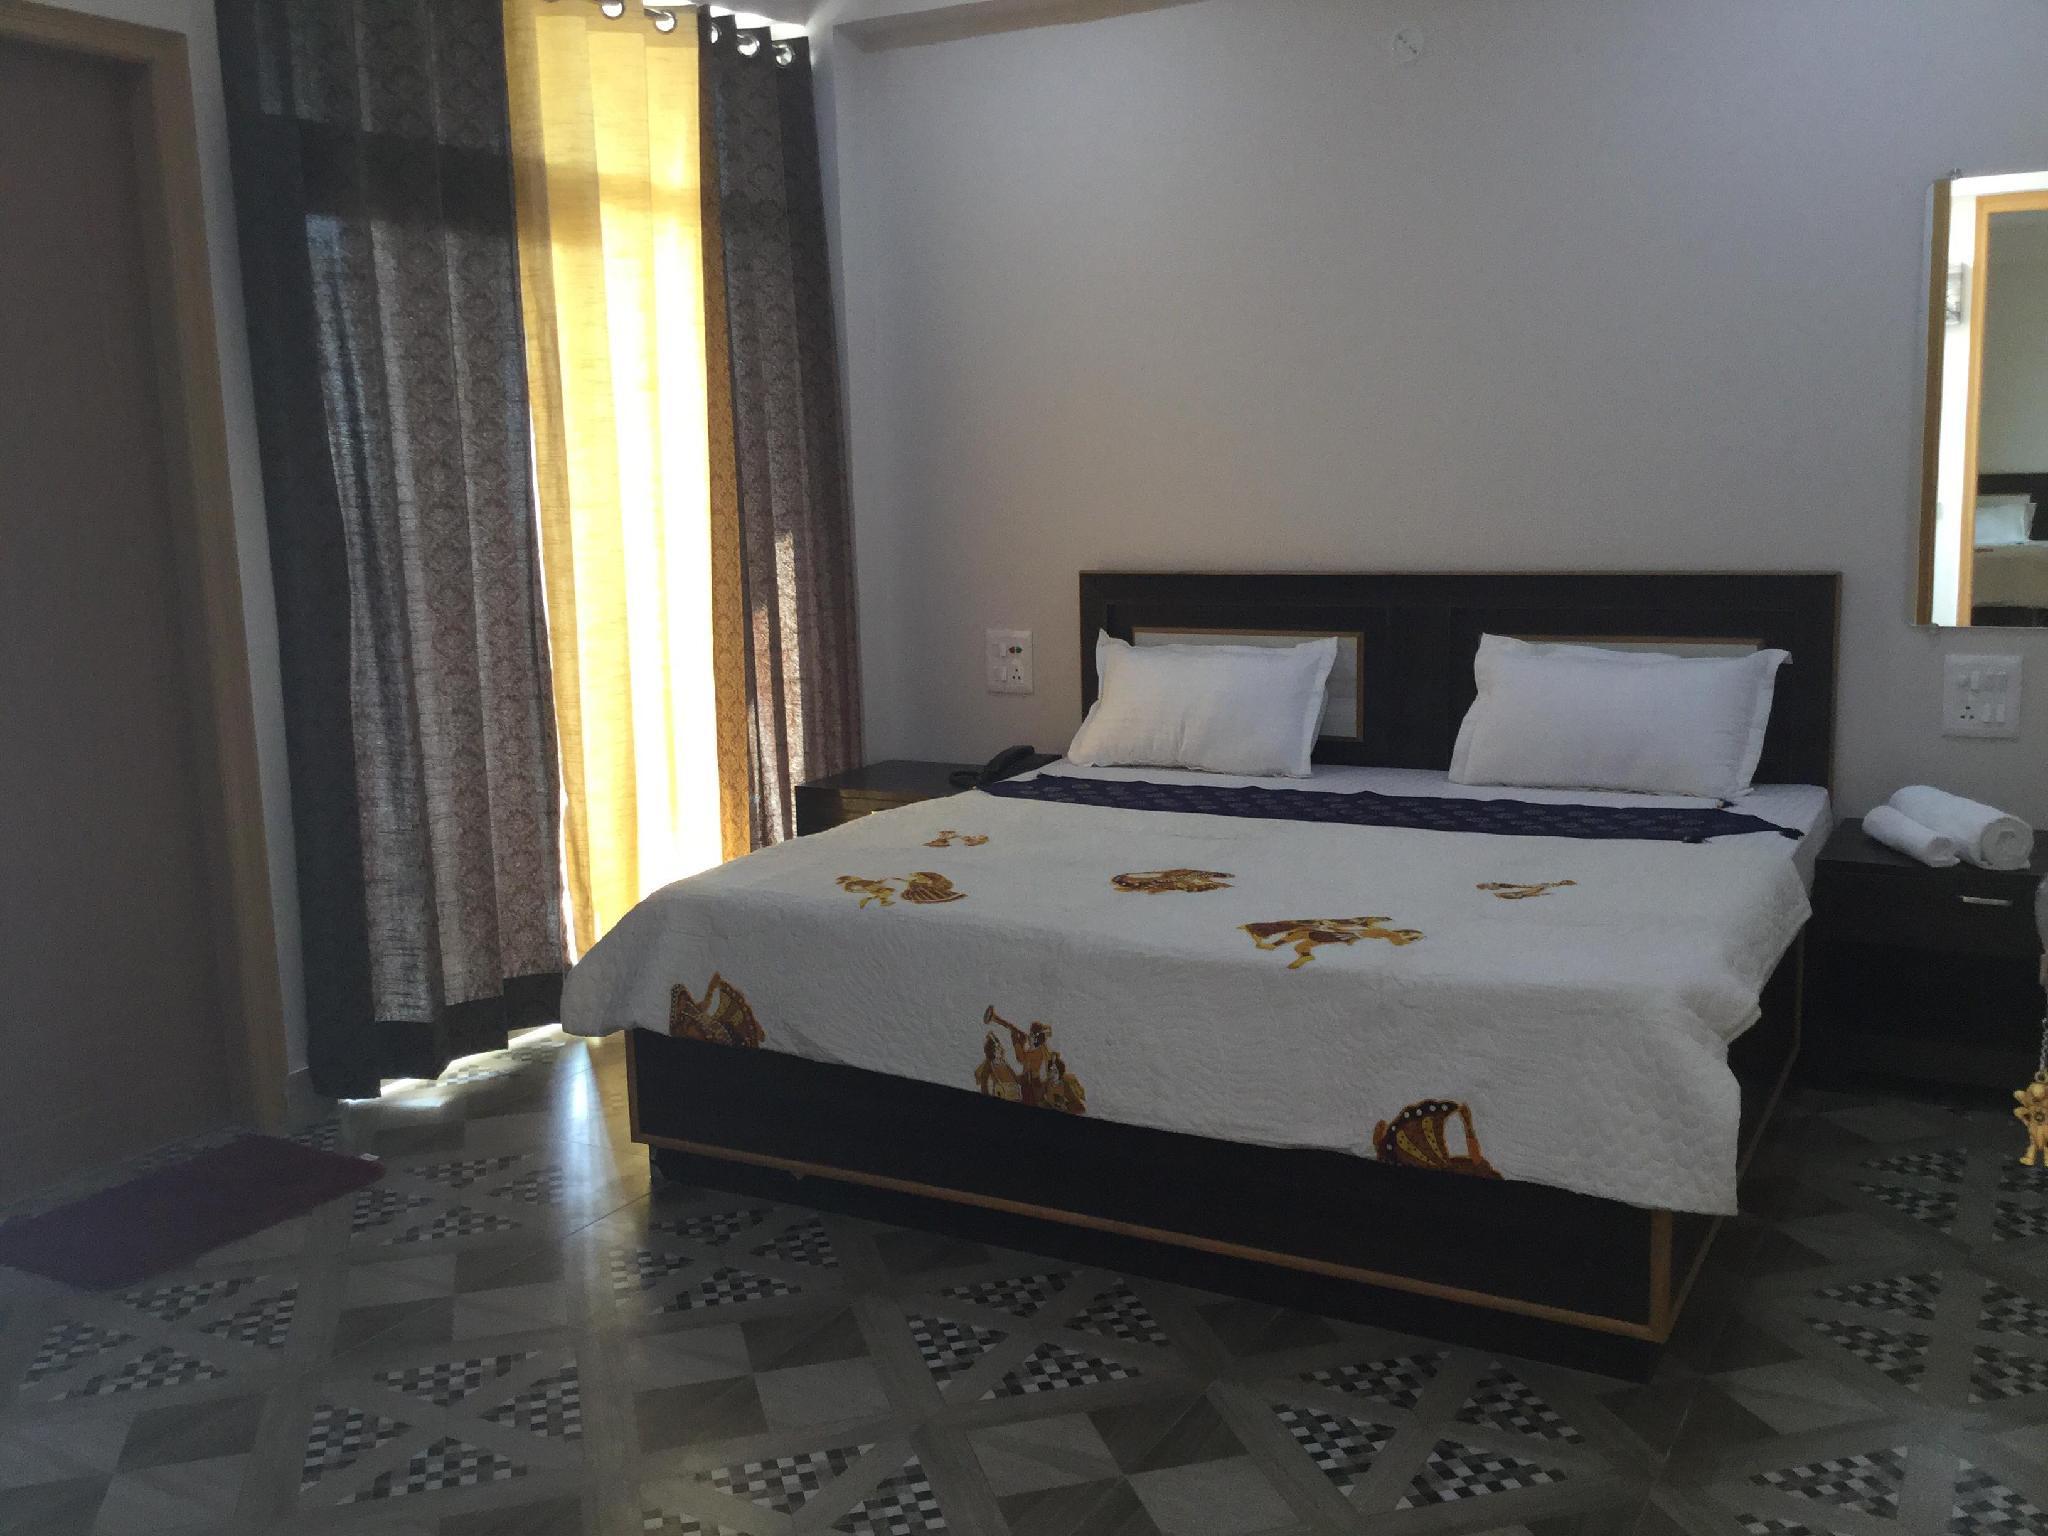 RUDRAM HOTEL YOGA & AYURVEDA RETREAT